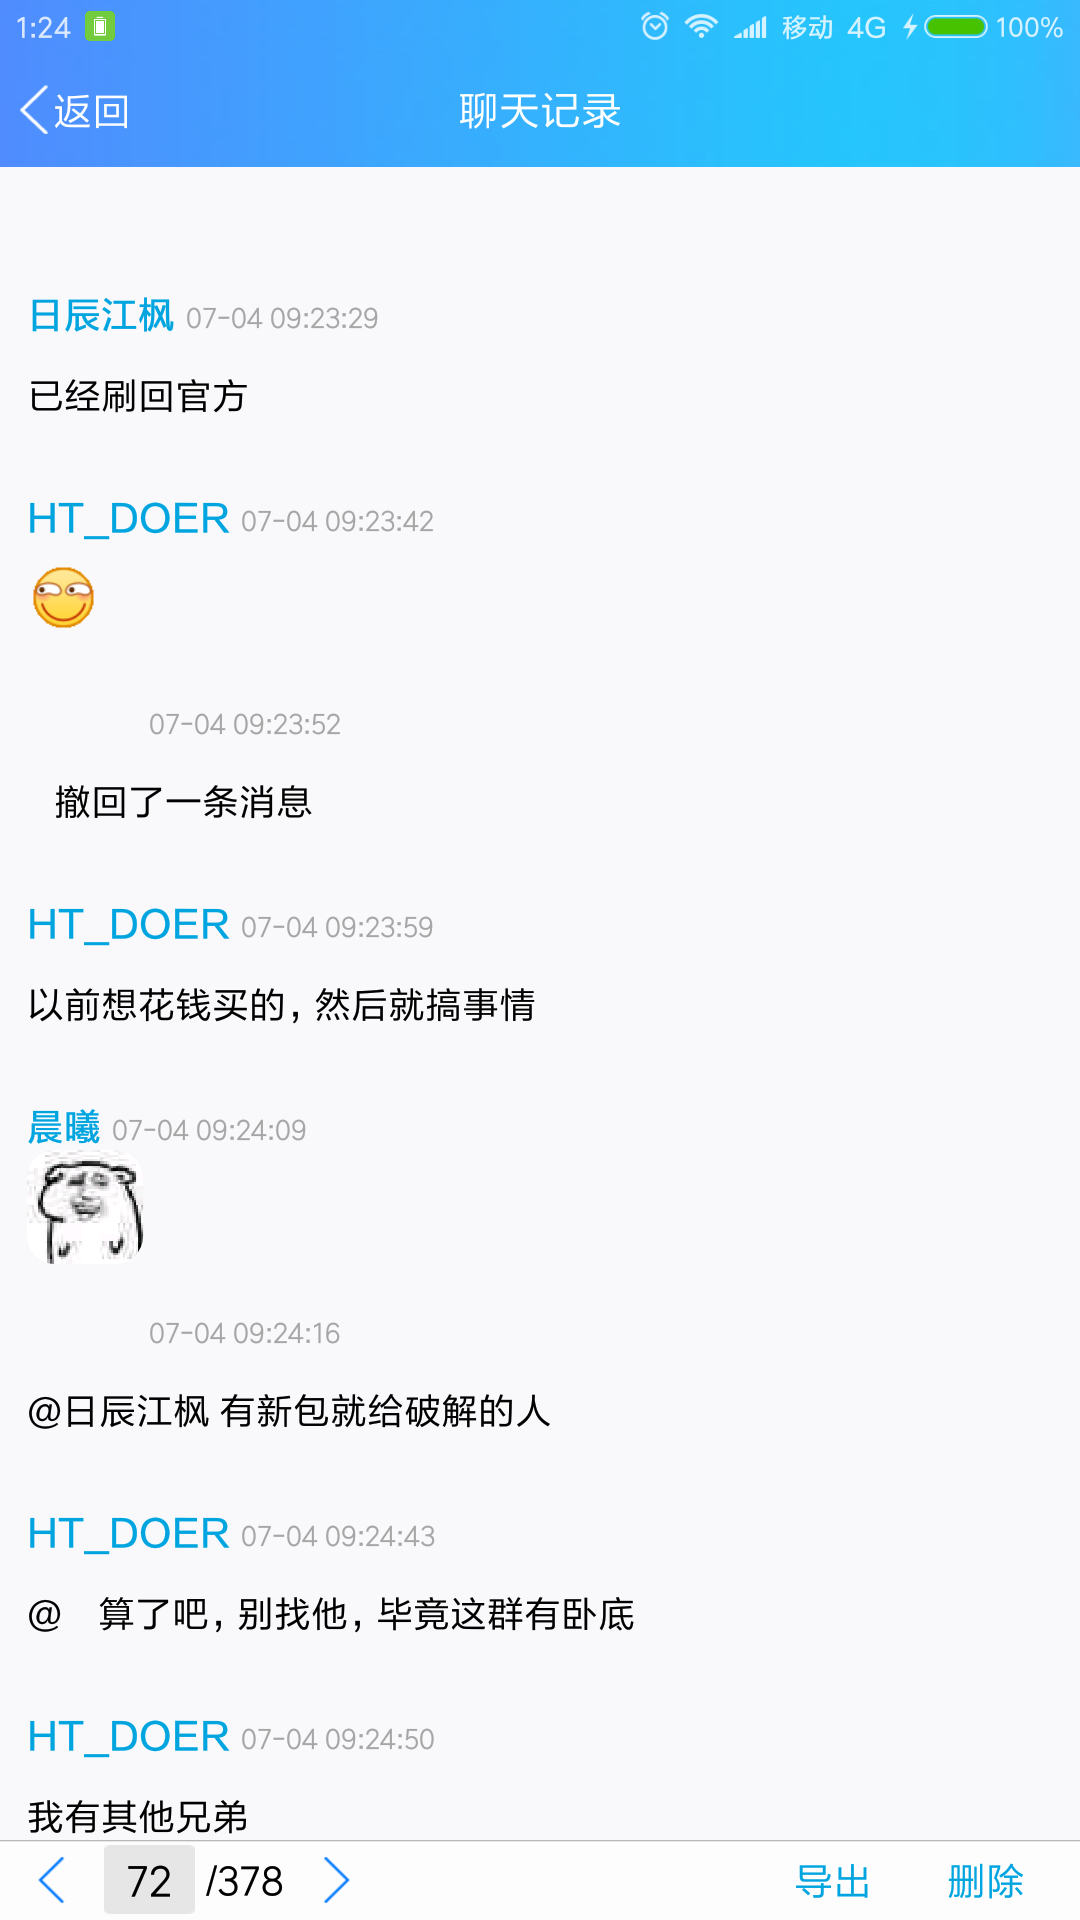 Screenshot_2017-07-09-01-24-49-176_com.tencent.mobileqq.png